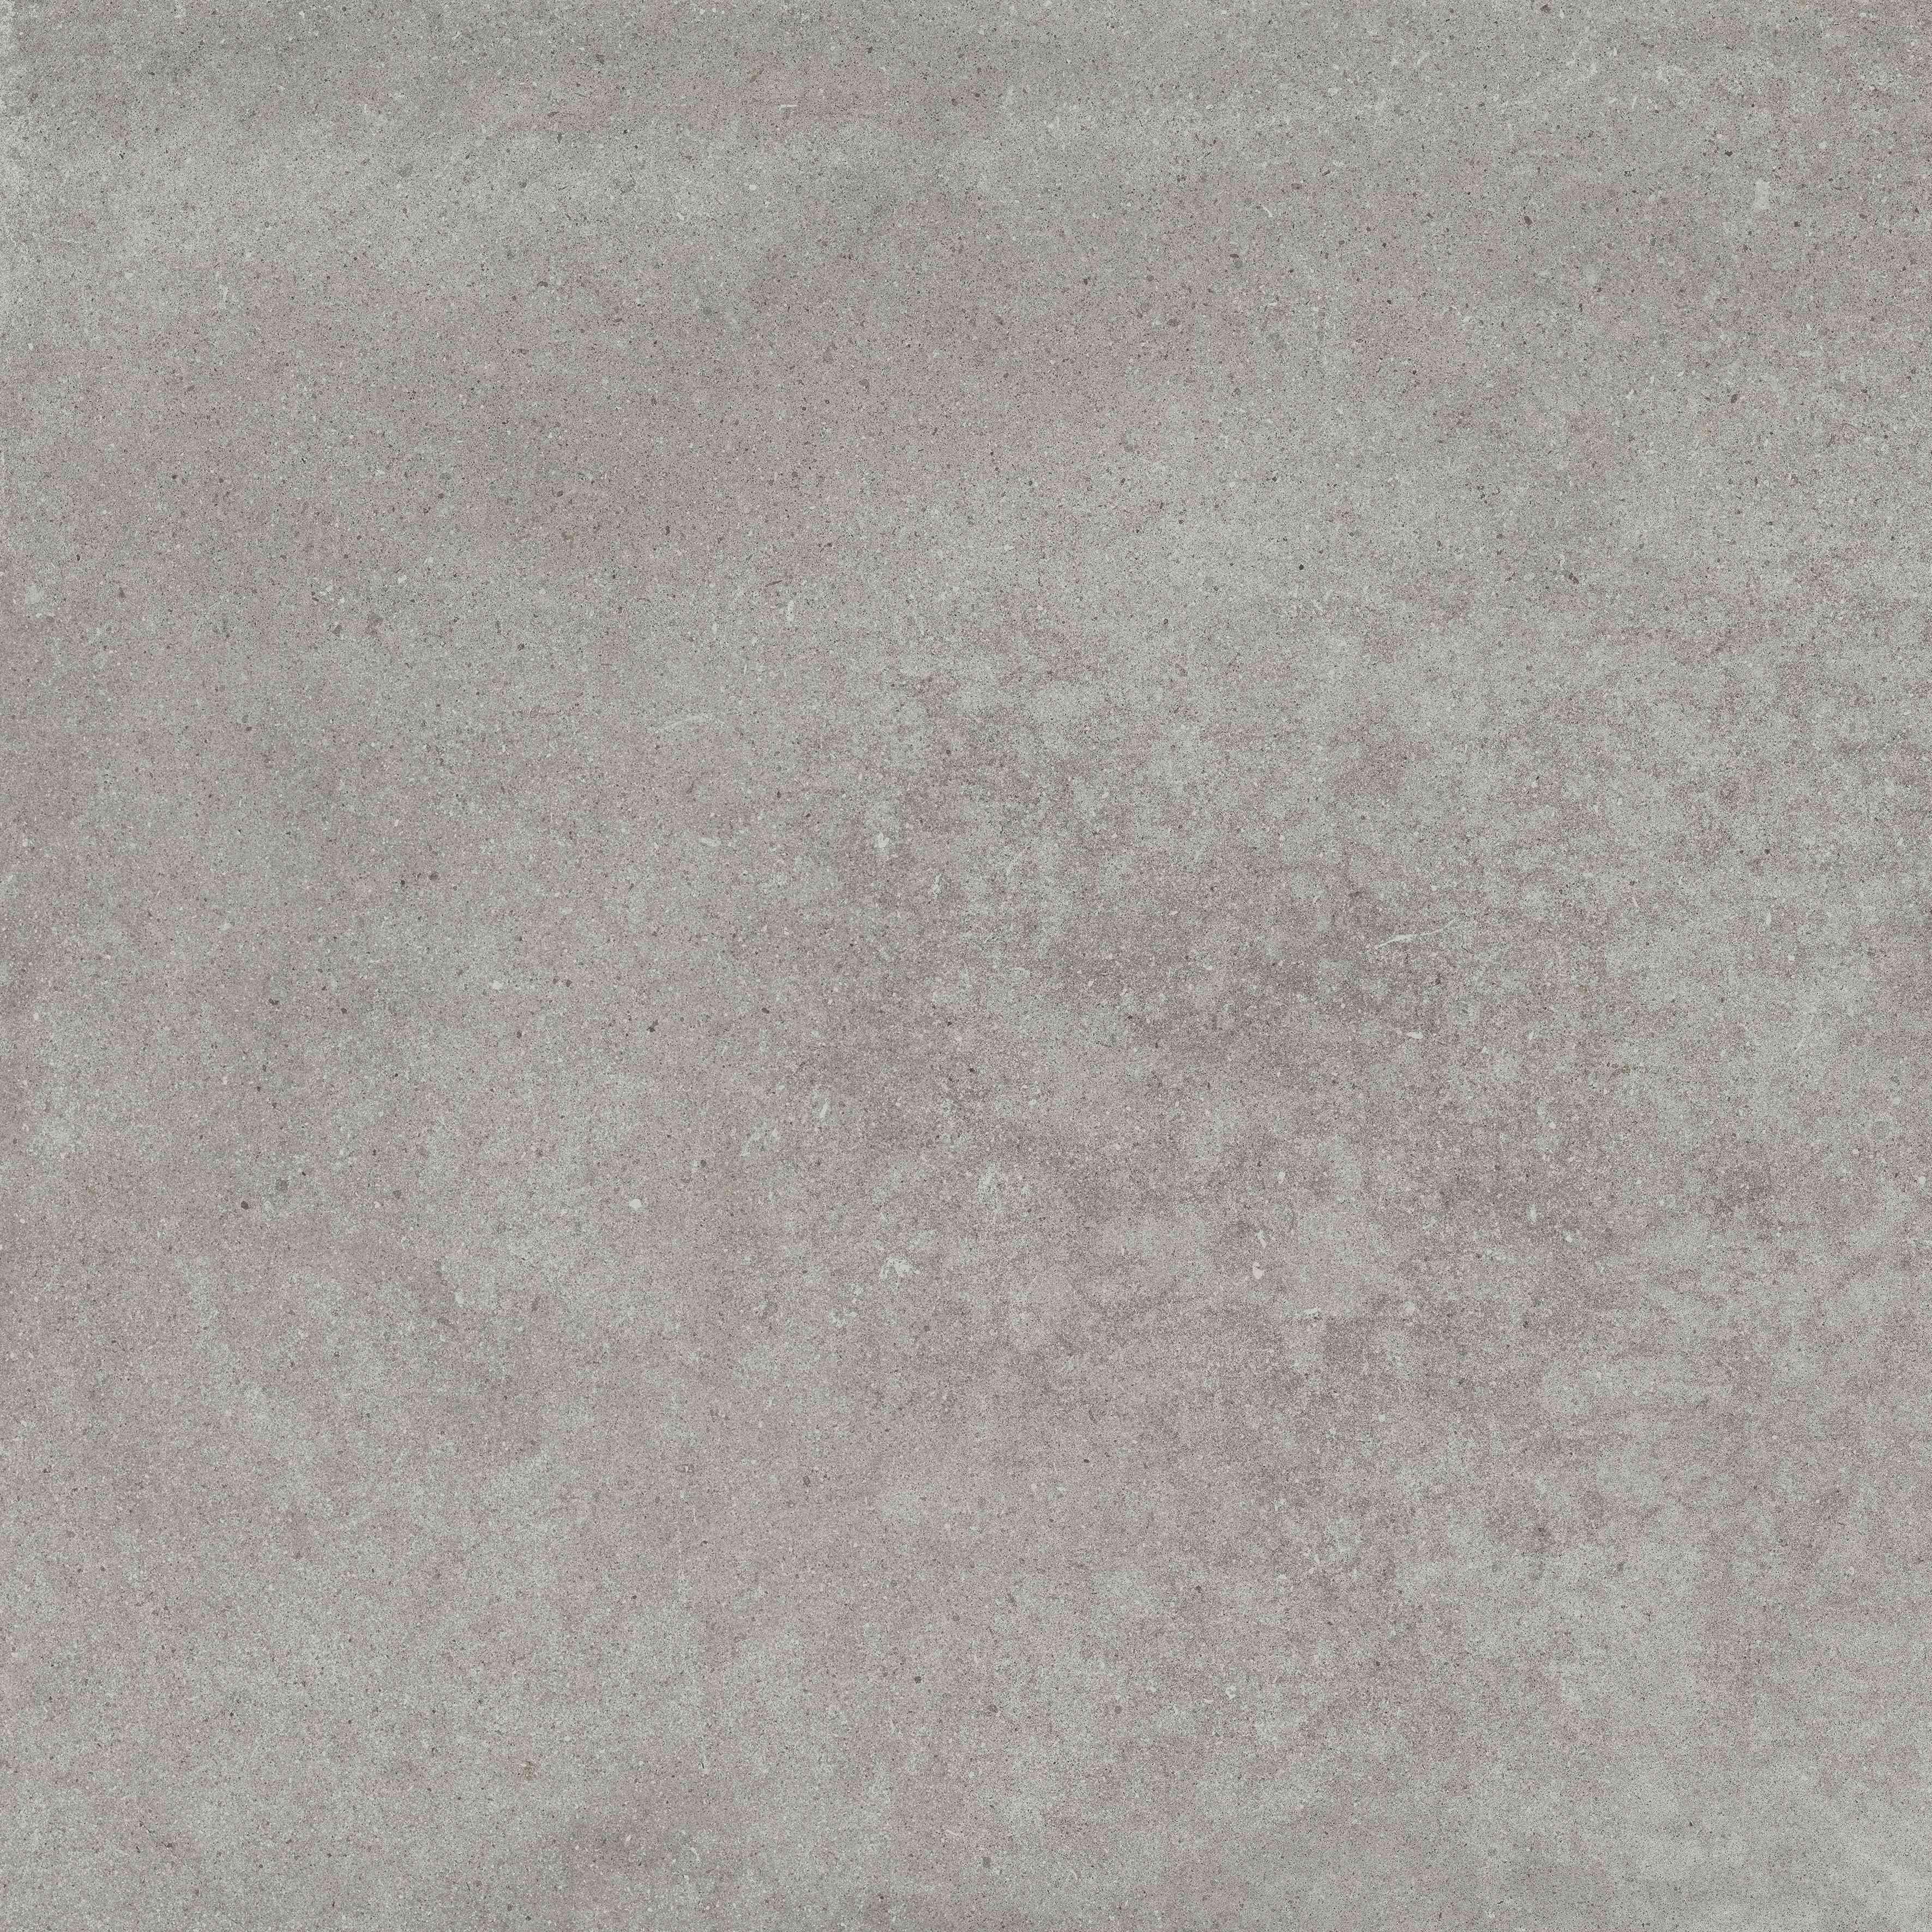 Плитка GRIGIO (ZRXRM8R) изображение 6